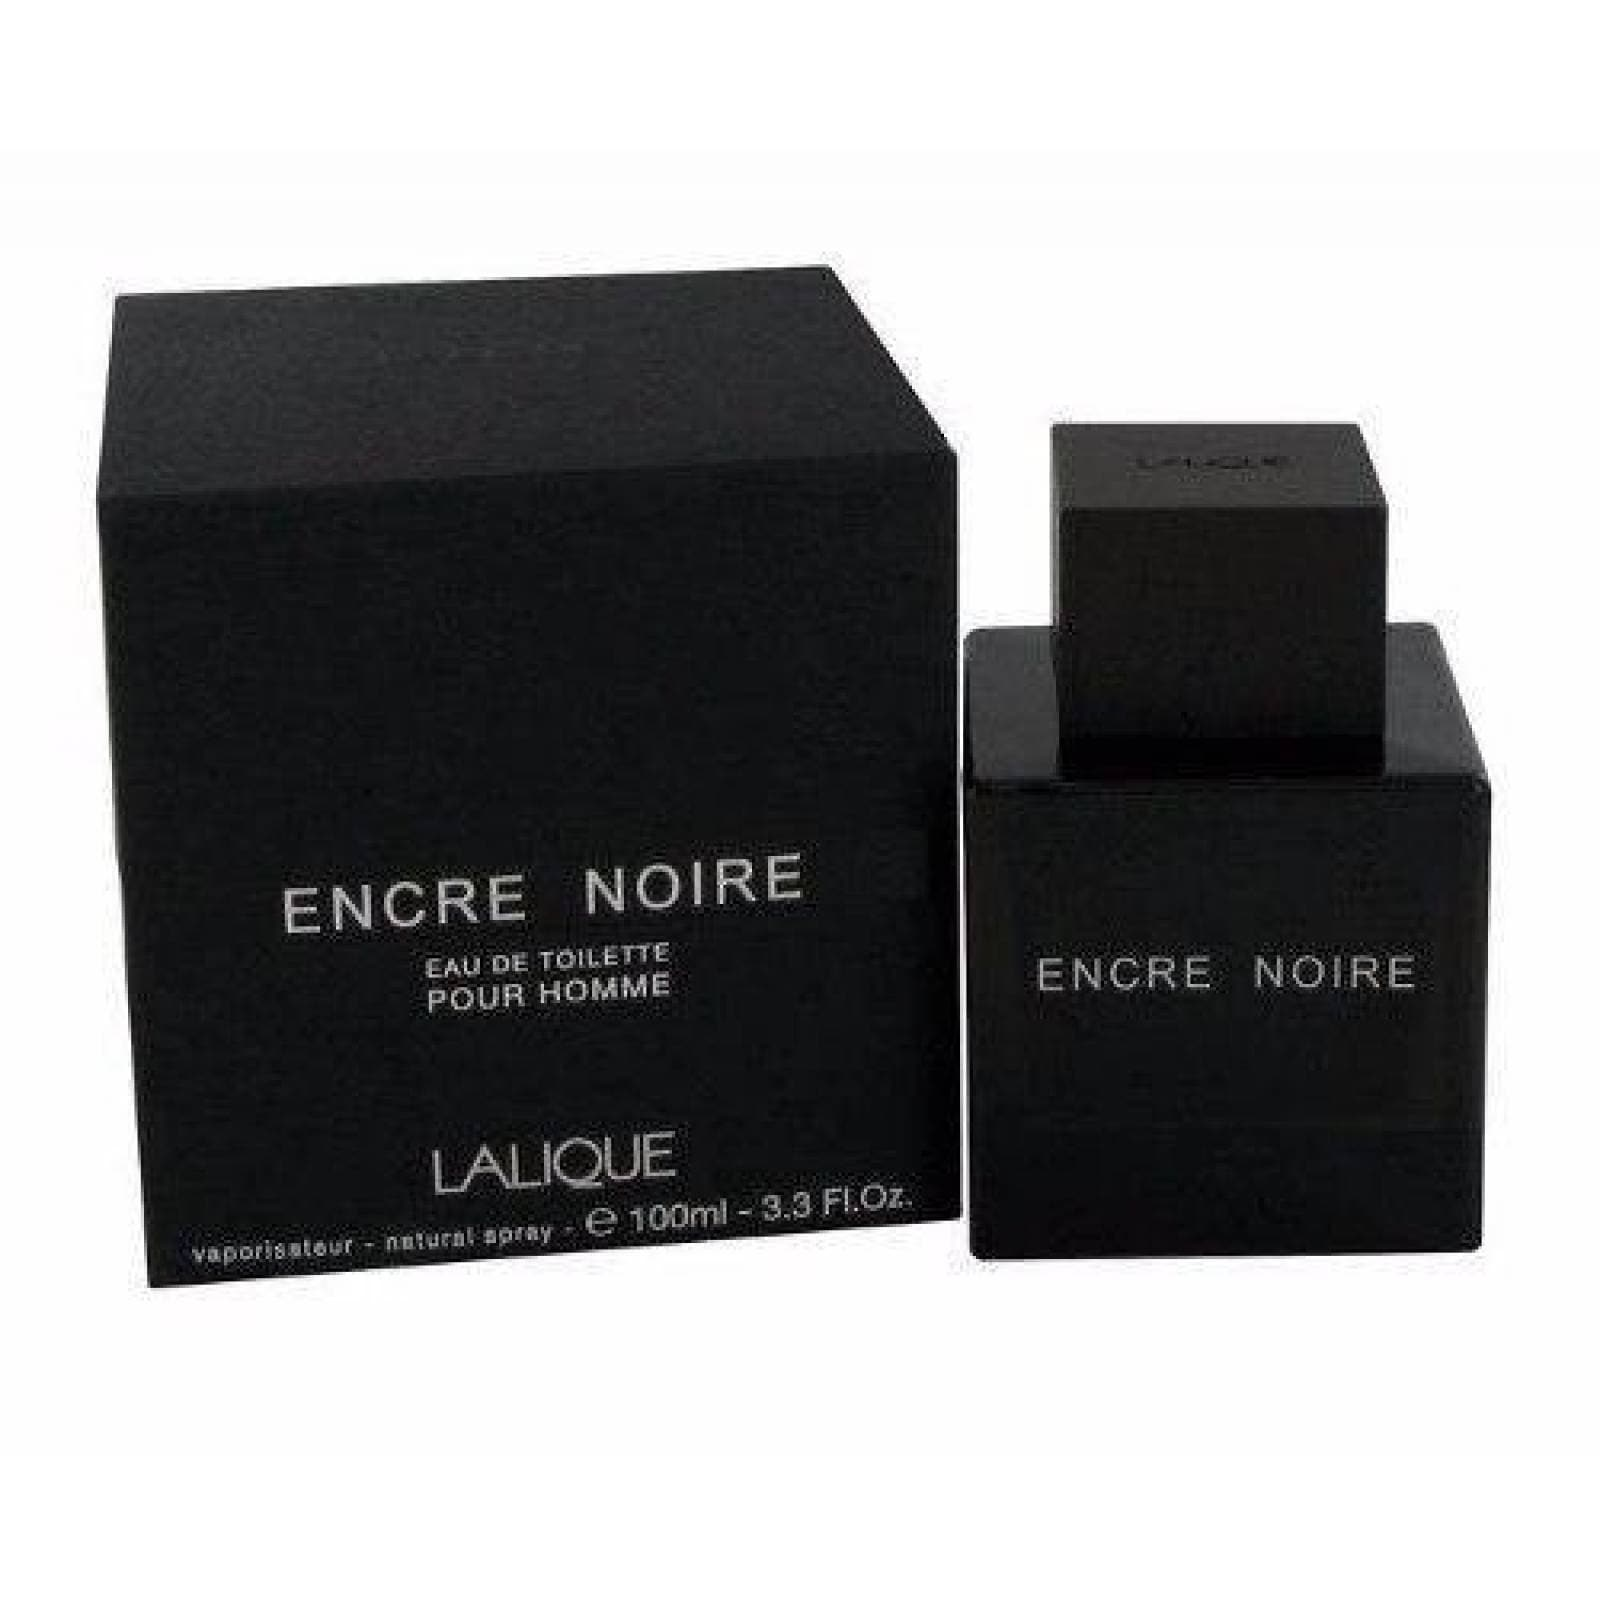 Encre Noire Caballero Lalique 100 Ml Edt Spray - Original